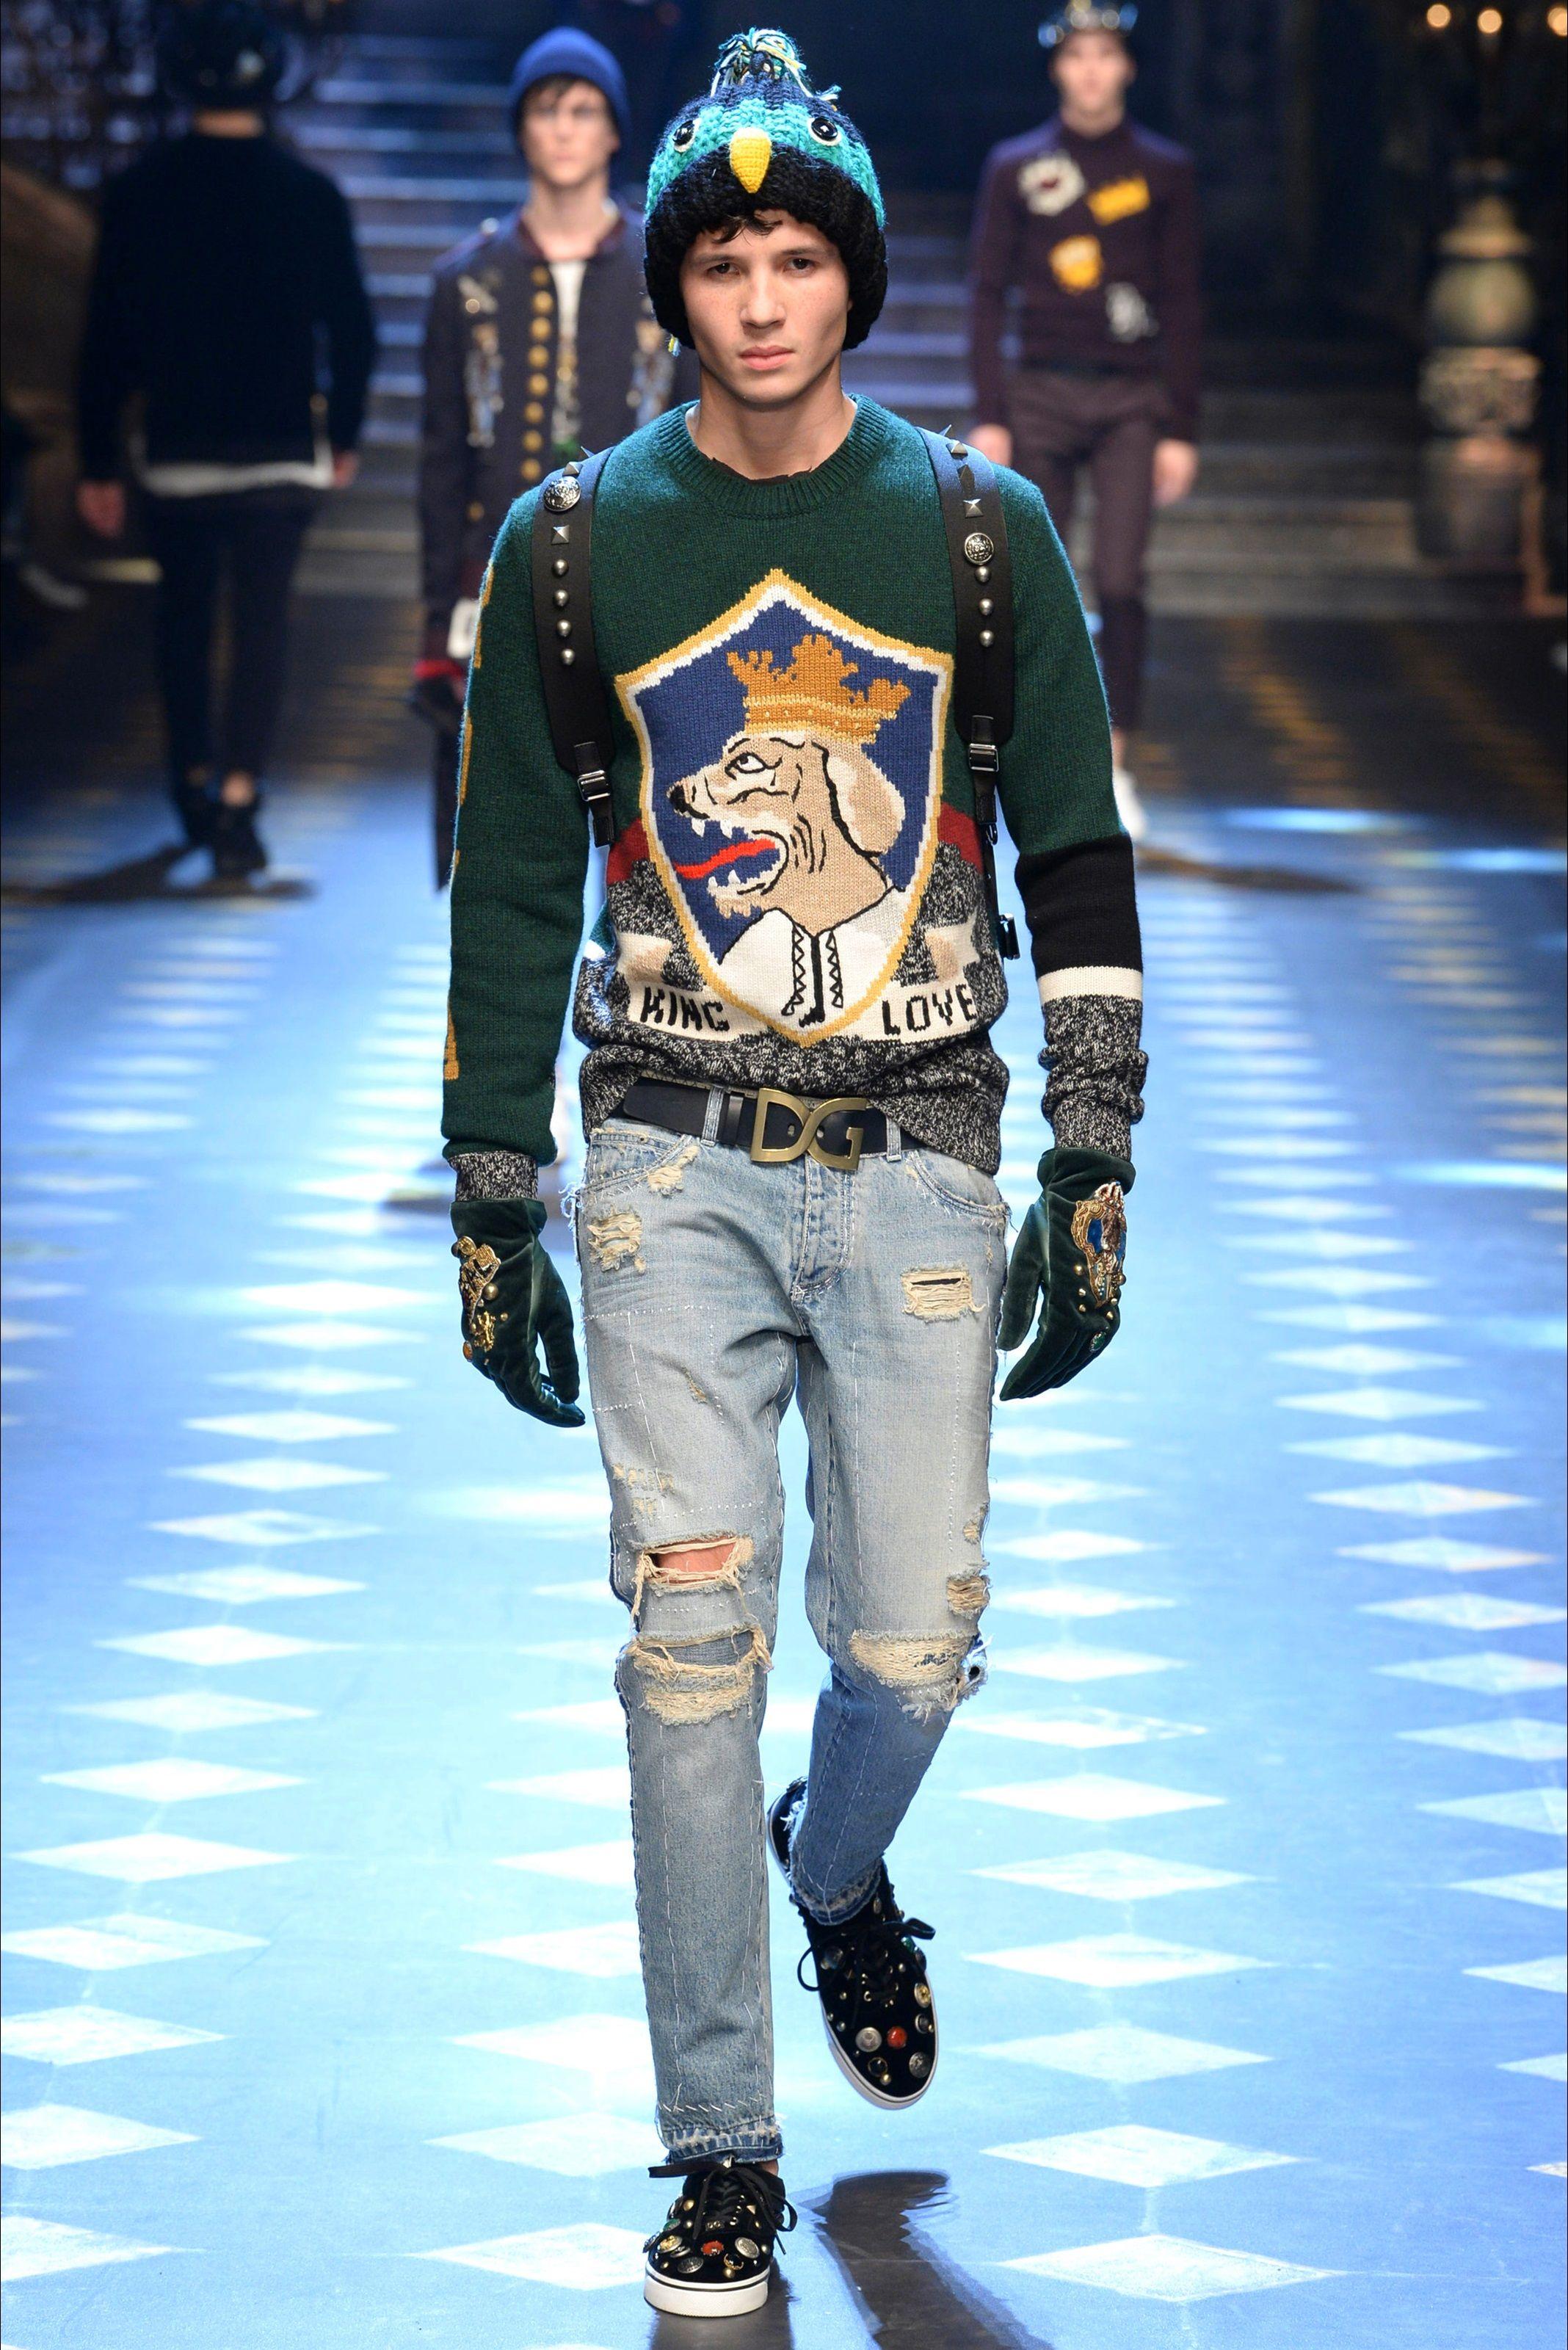 Sfilata Moda Uomo Dolce   Gabbana Milano - Autunno Inverno 2017-18 - Vogue 08305730323